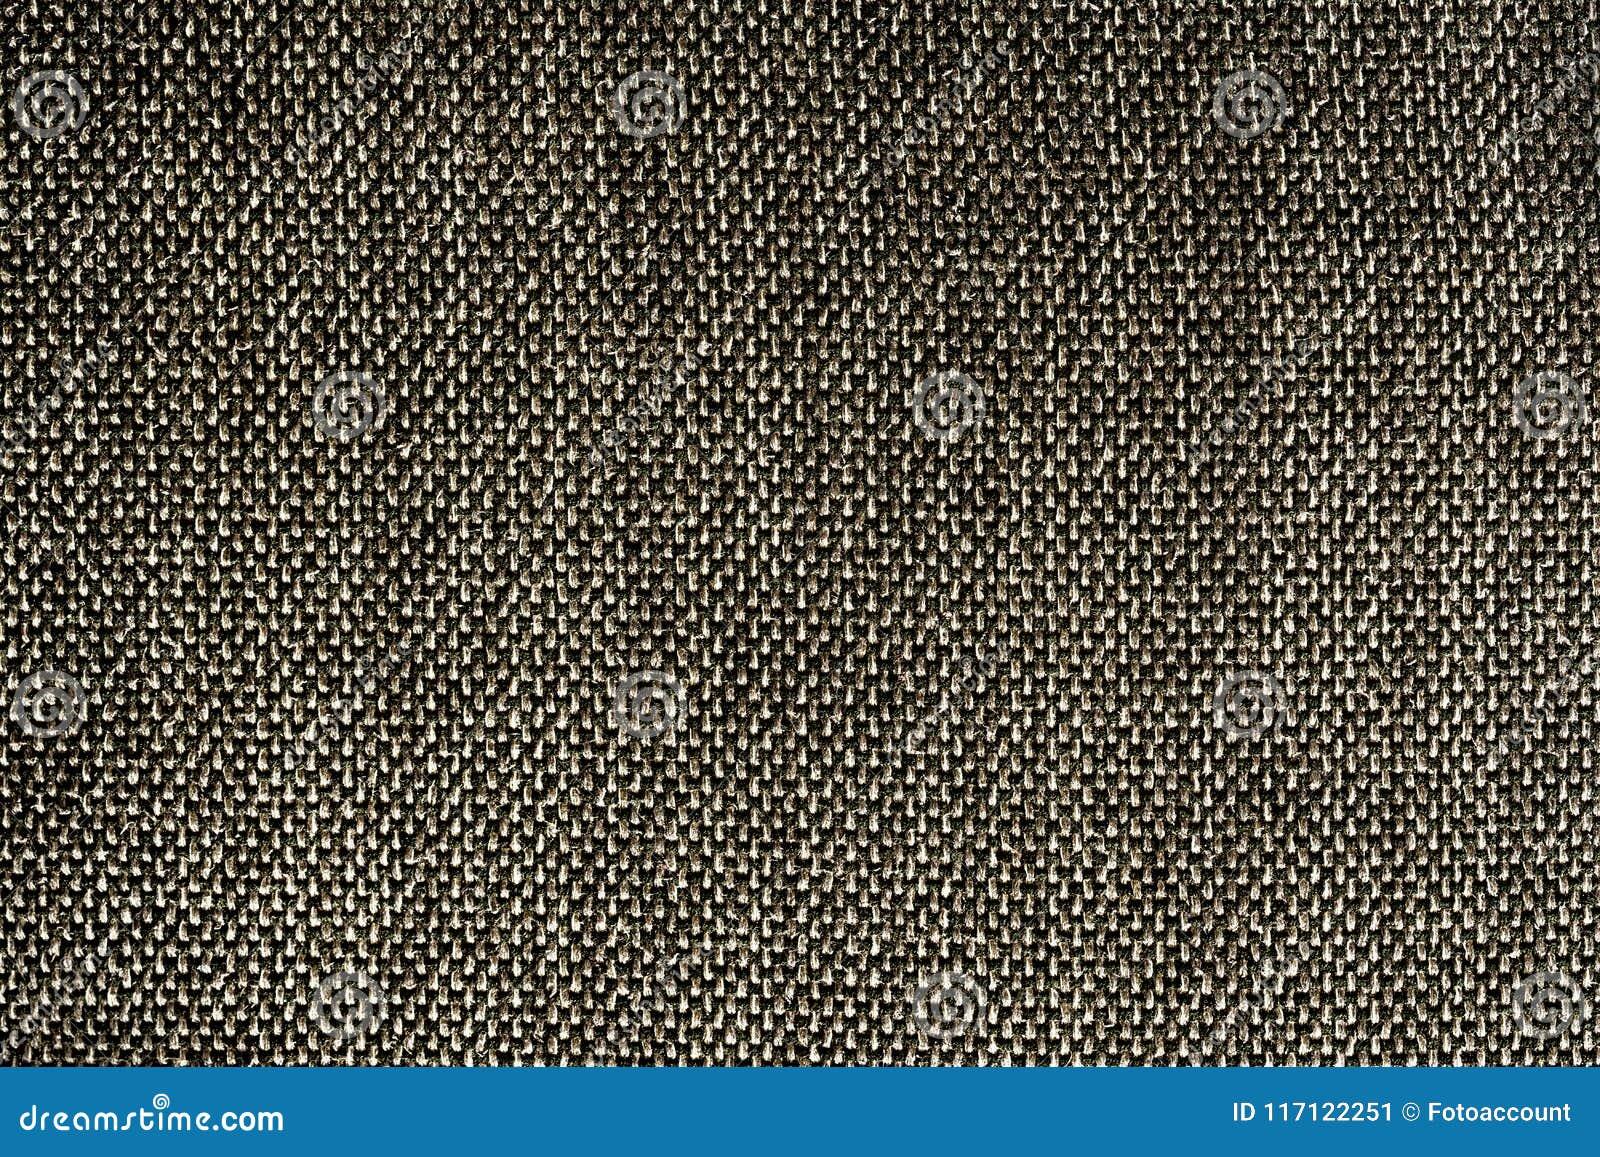 Closeup Black Color Synthetic Fabrics Texture - Pattern Design